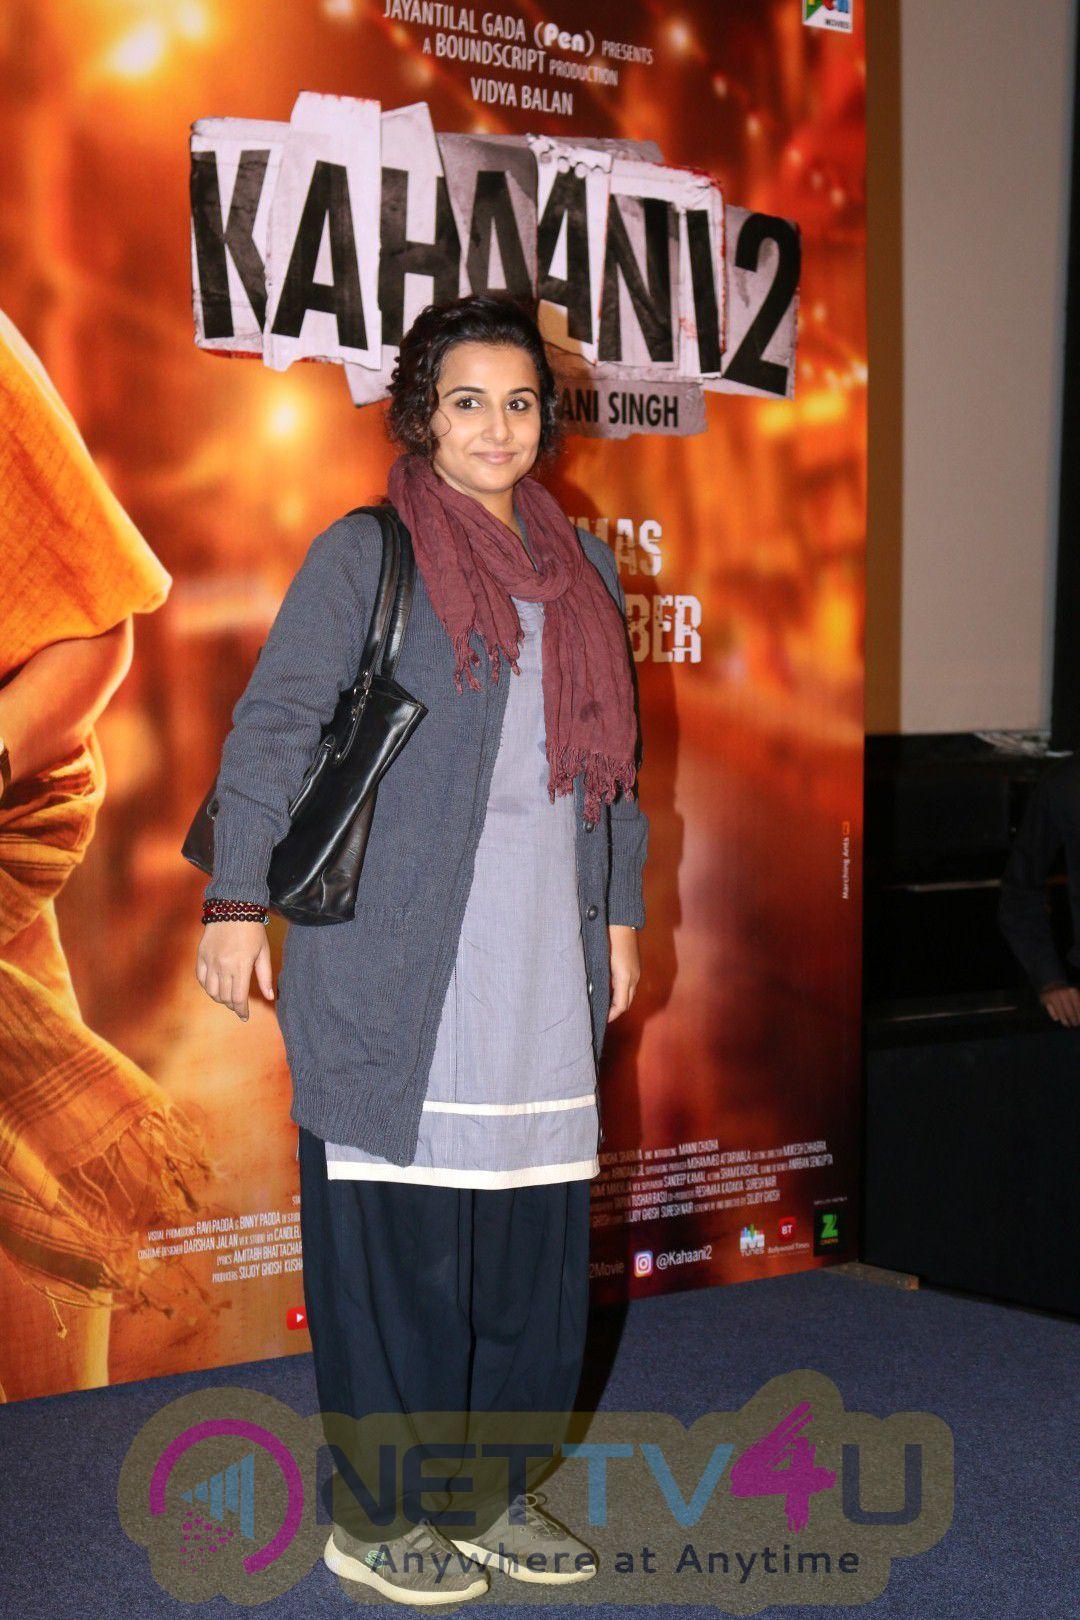 Vidya Balan In Kahaani 2 Durga Rani Singh Official Trailer Launch